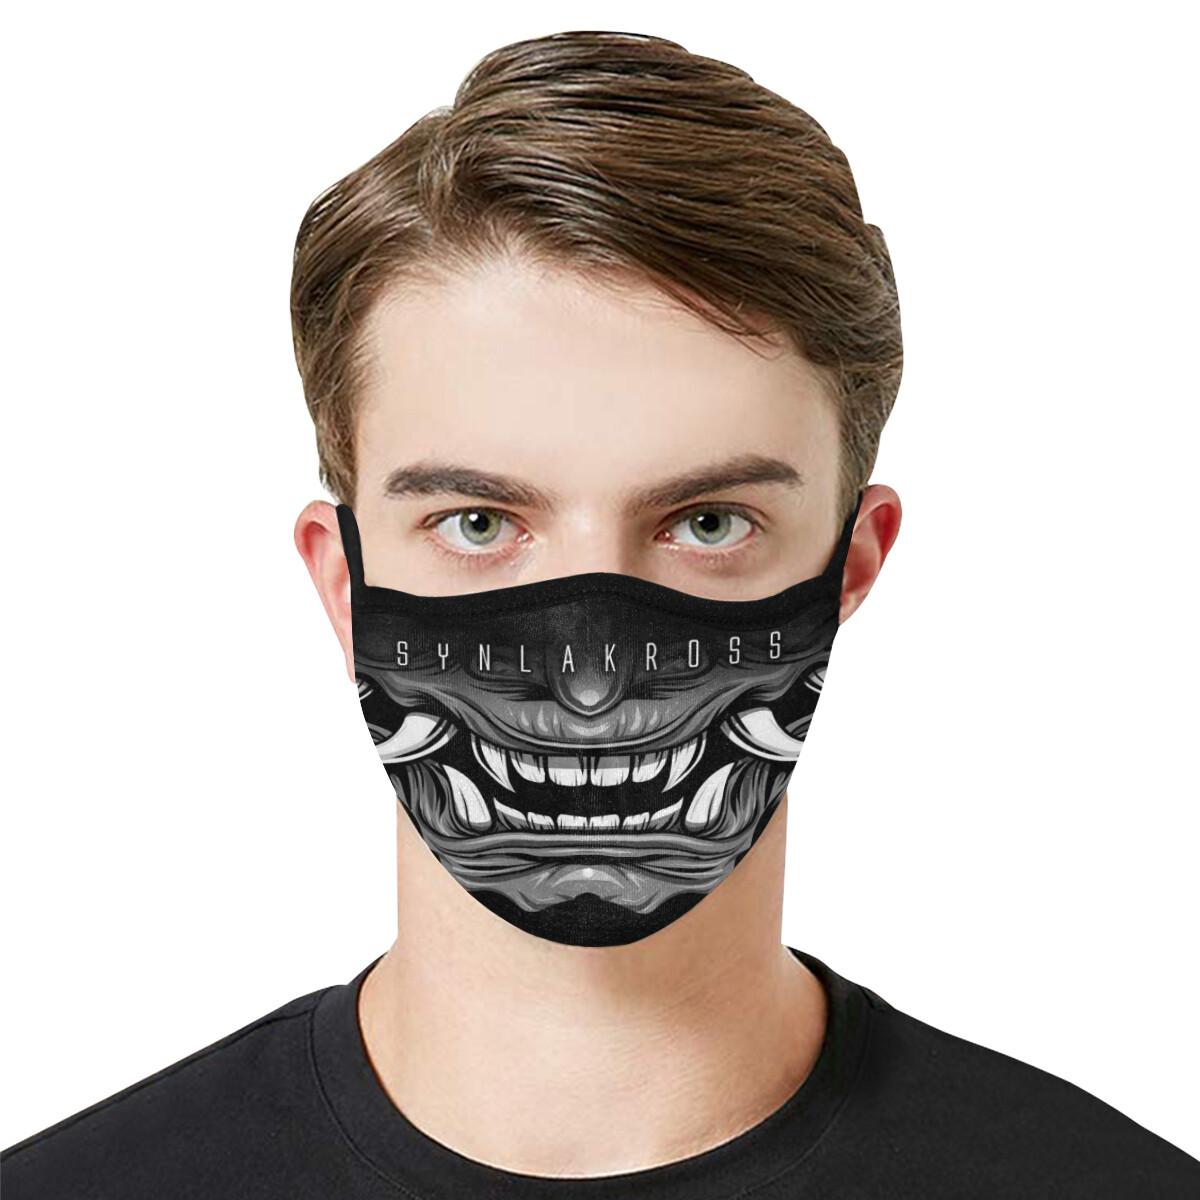 Samurai Face Mask (adults and kids)